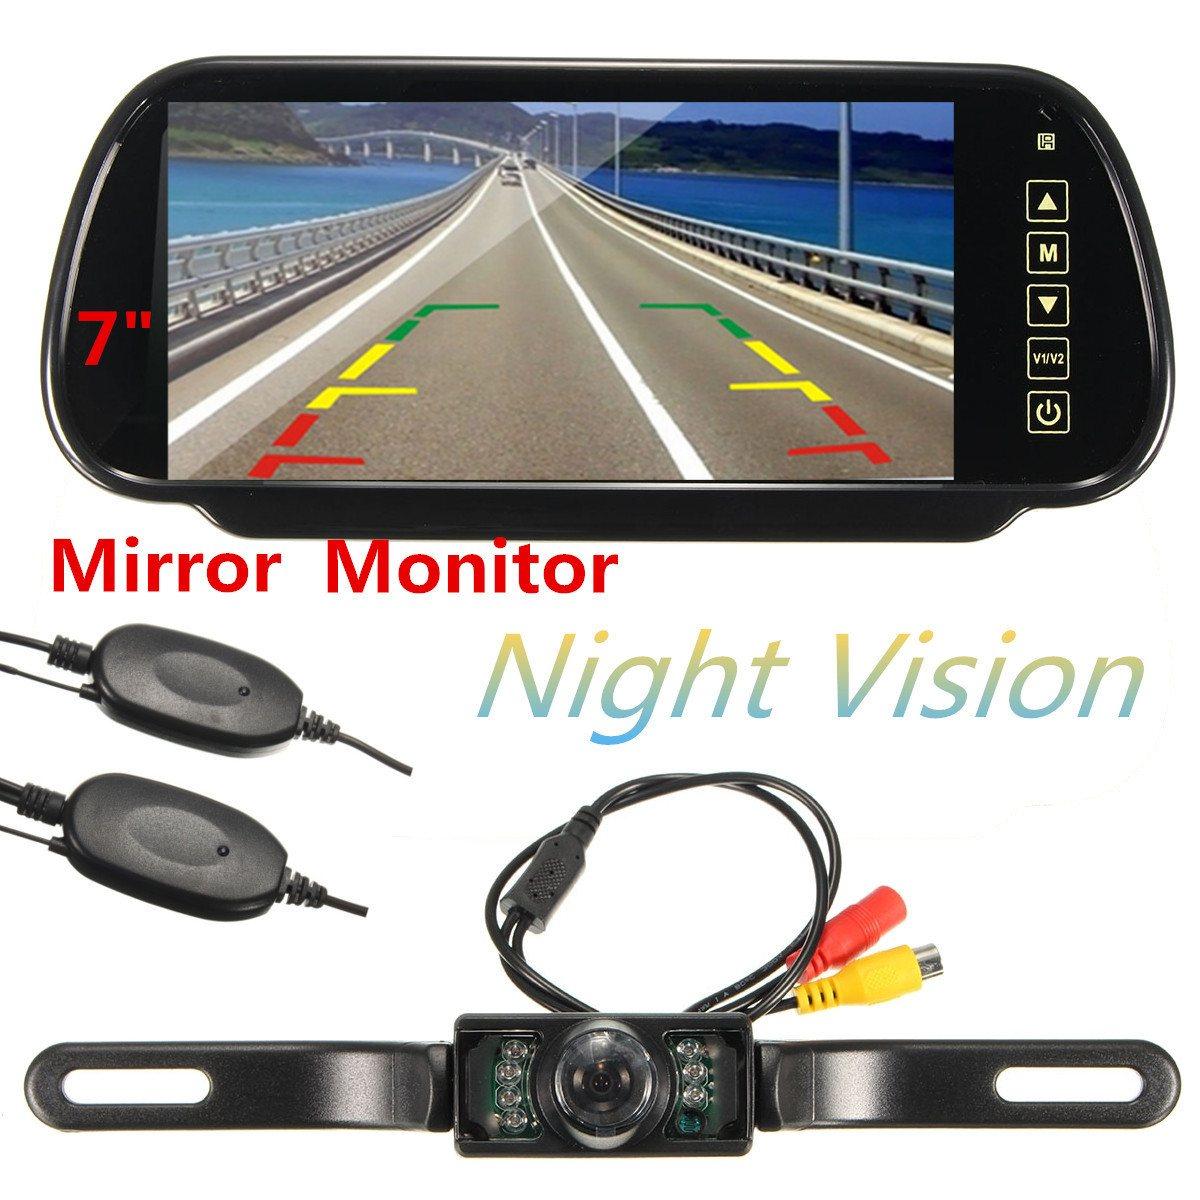 HD 7 Inch TFT LCD Display 1024*600 Car Mirror Monitor MP5 Rear View Camera Parking System